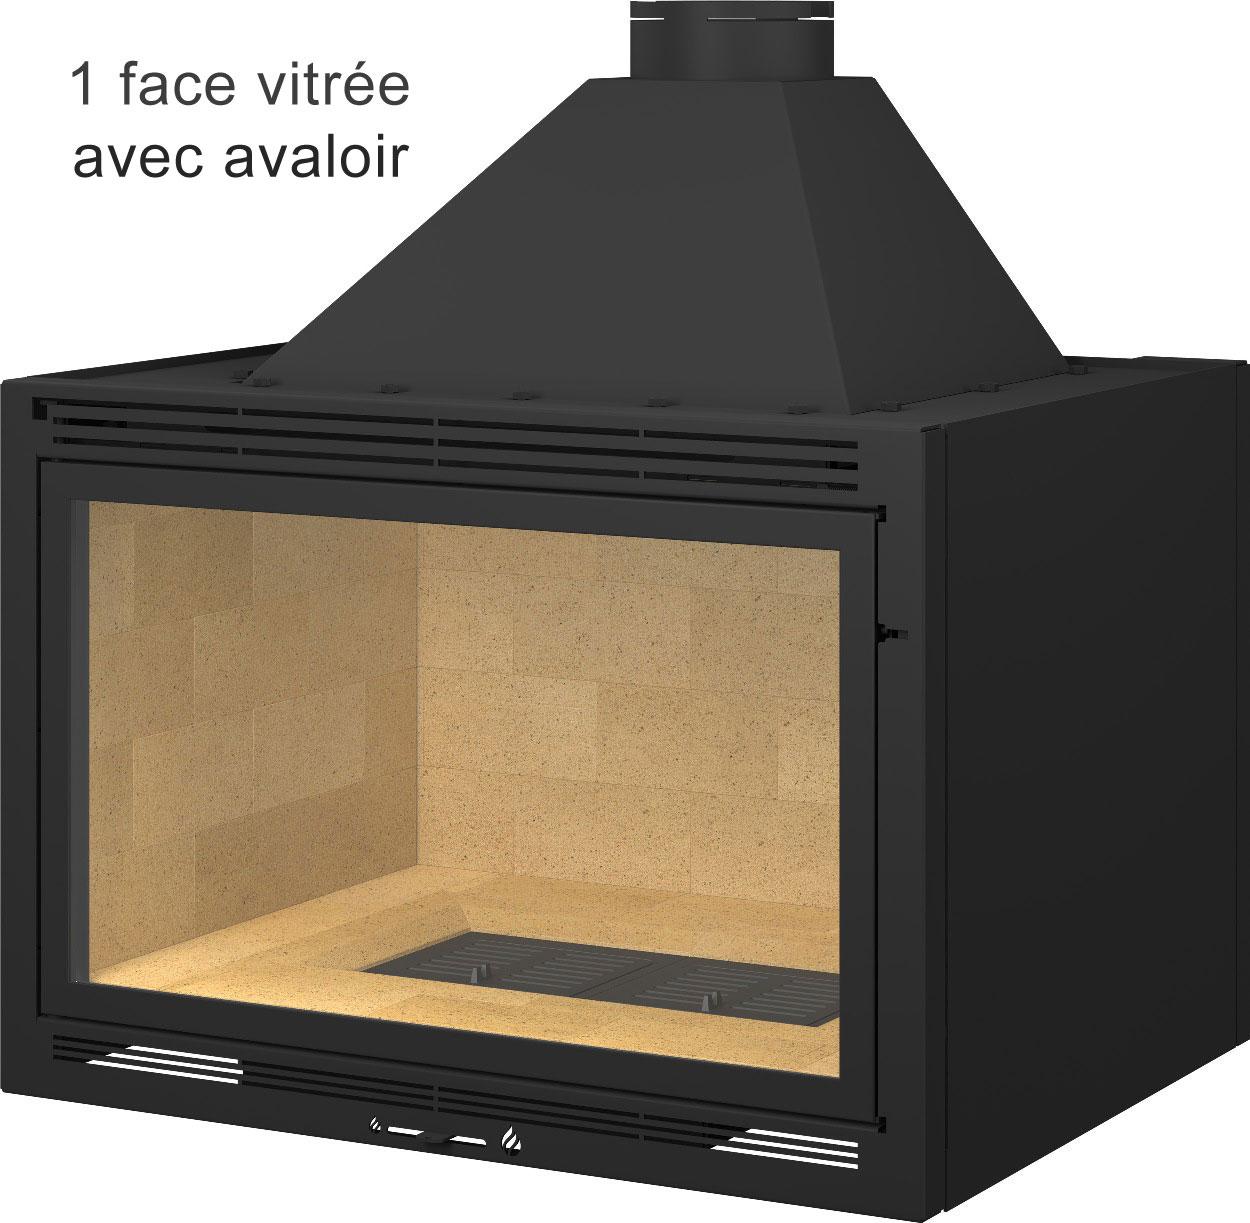 insert de chemin e sur mesure 600 l x500 h x500 p 3. Black Bedroom Furniture Sets. Home Design Ideas